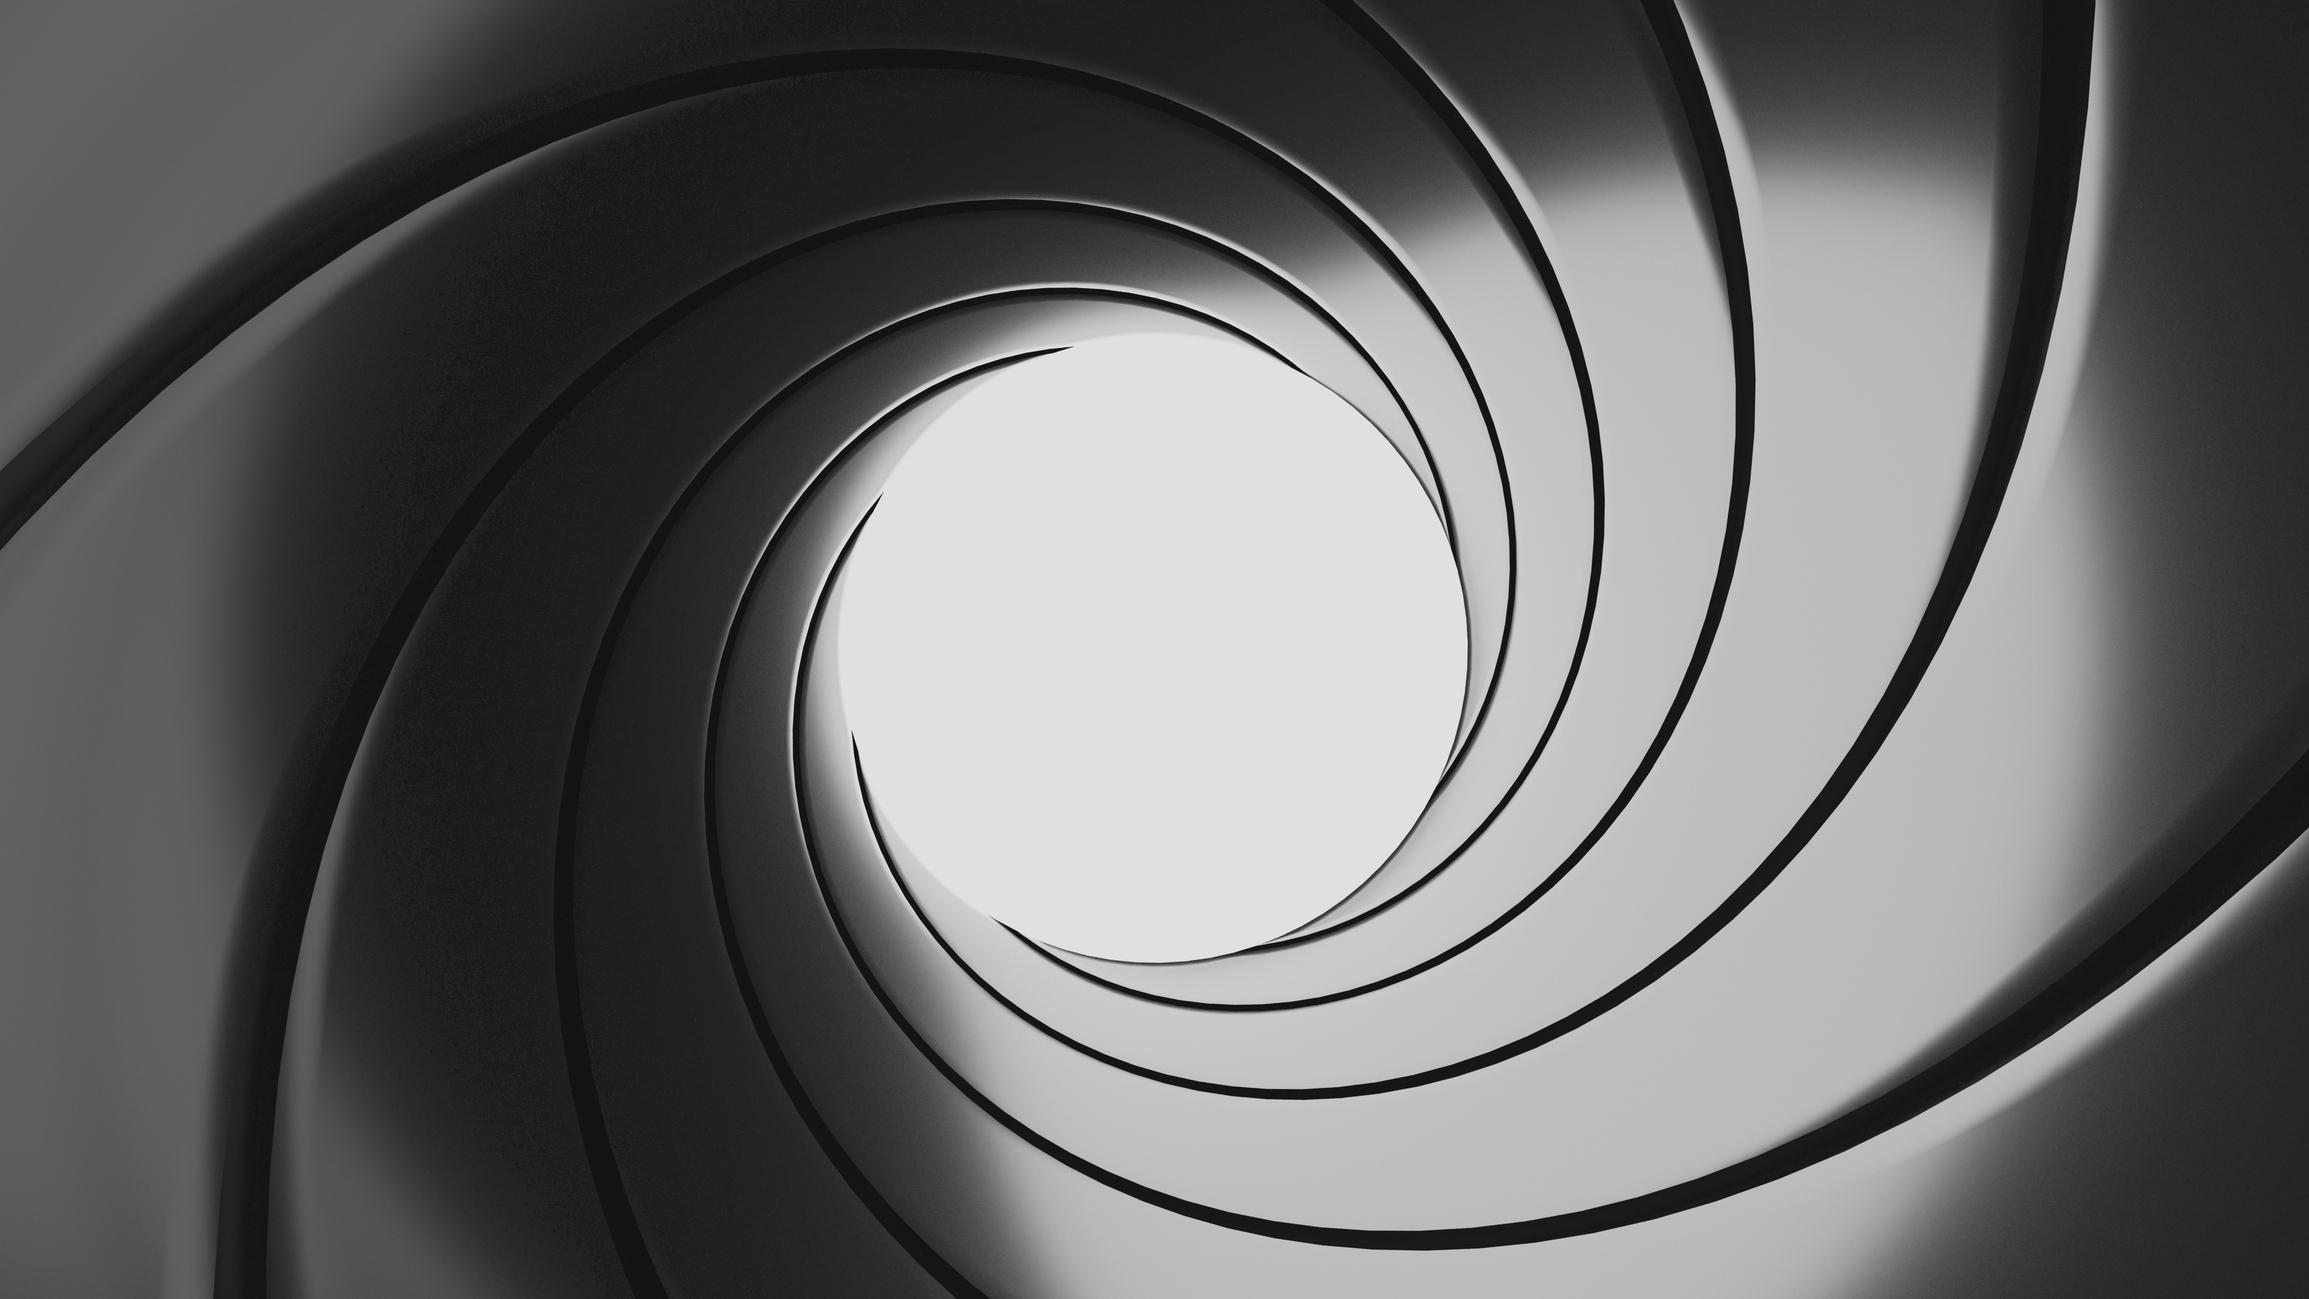 A view down a gun barrel - a classic James Bond 007 theme.